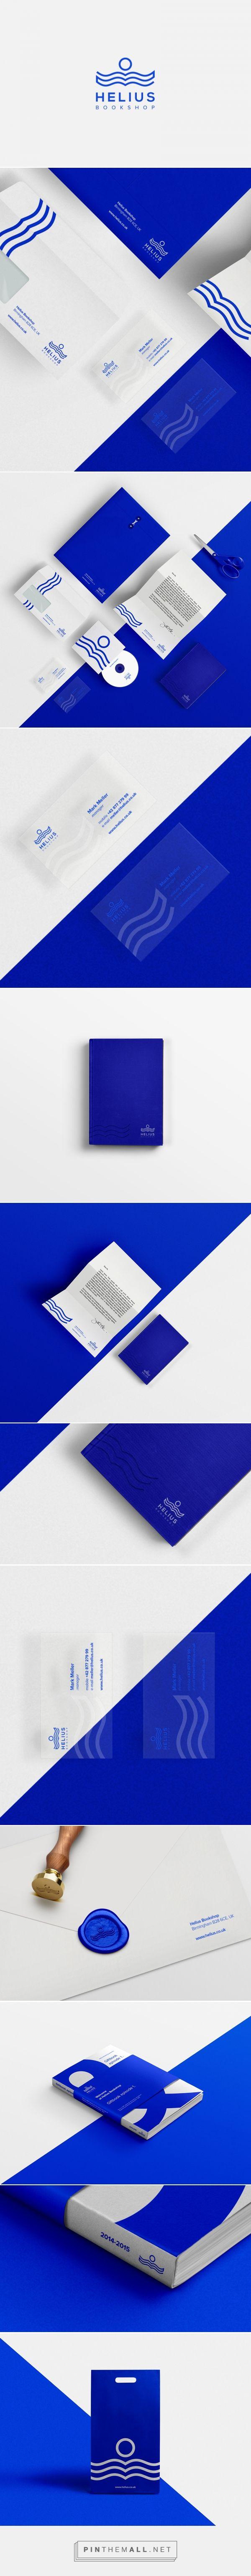 Helius bookshop Branding on Behance | Fivestar Branding – Design and Branding Agency & Inspiration Gallery